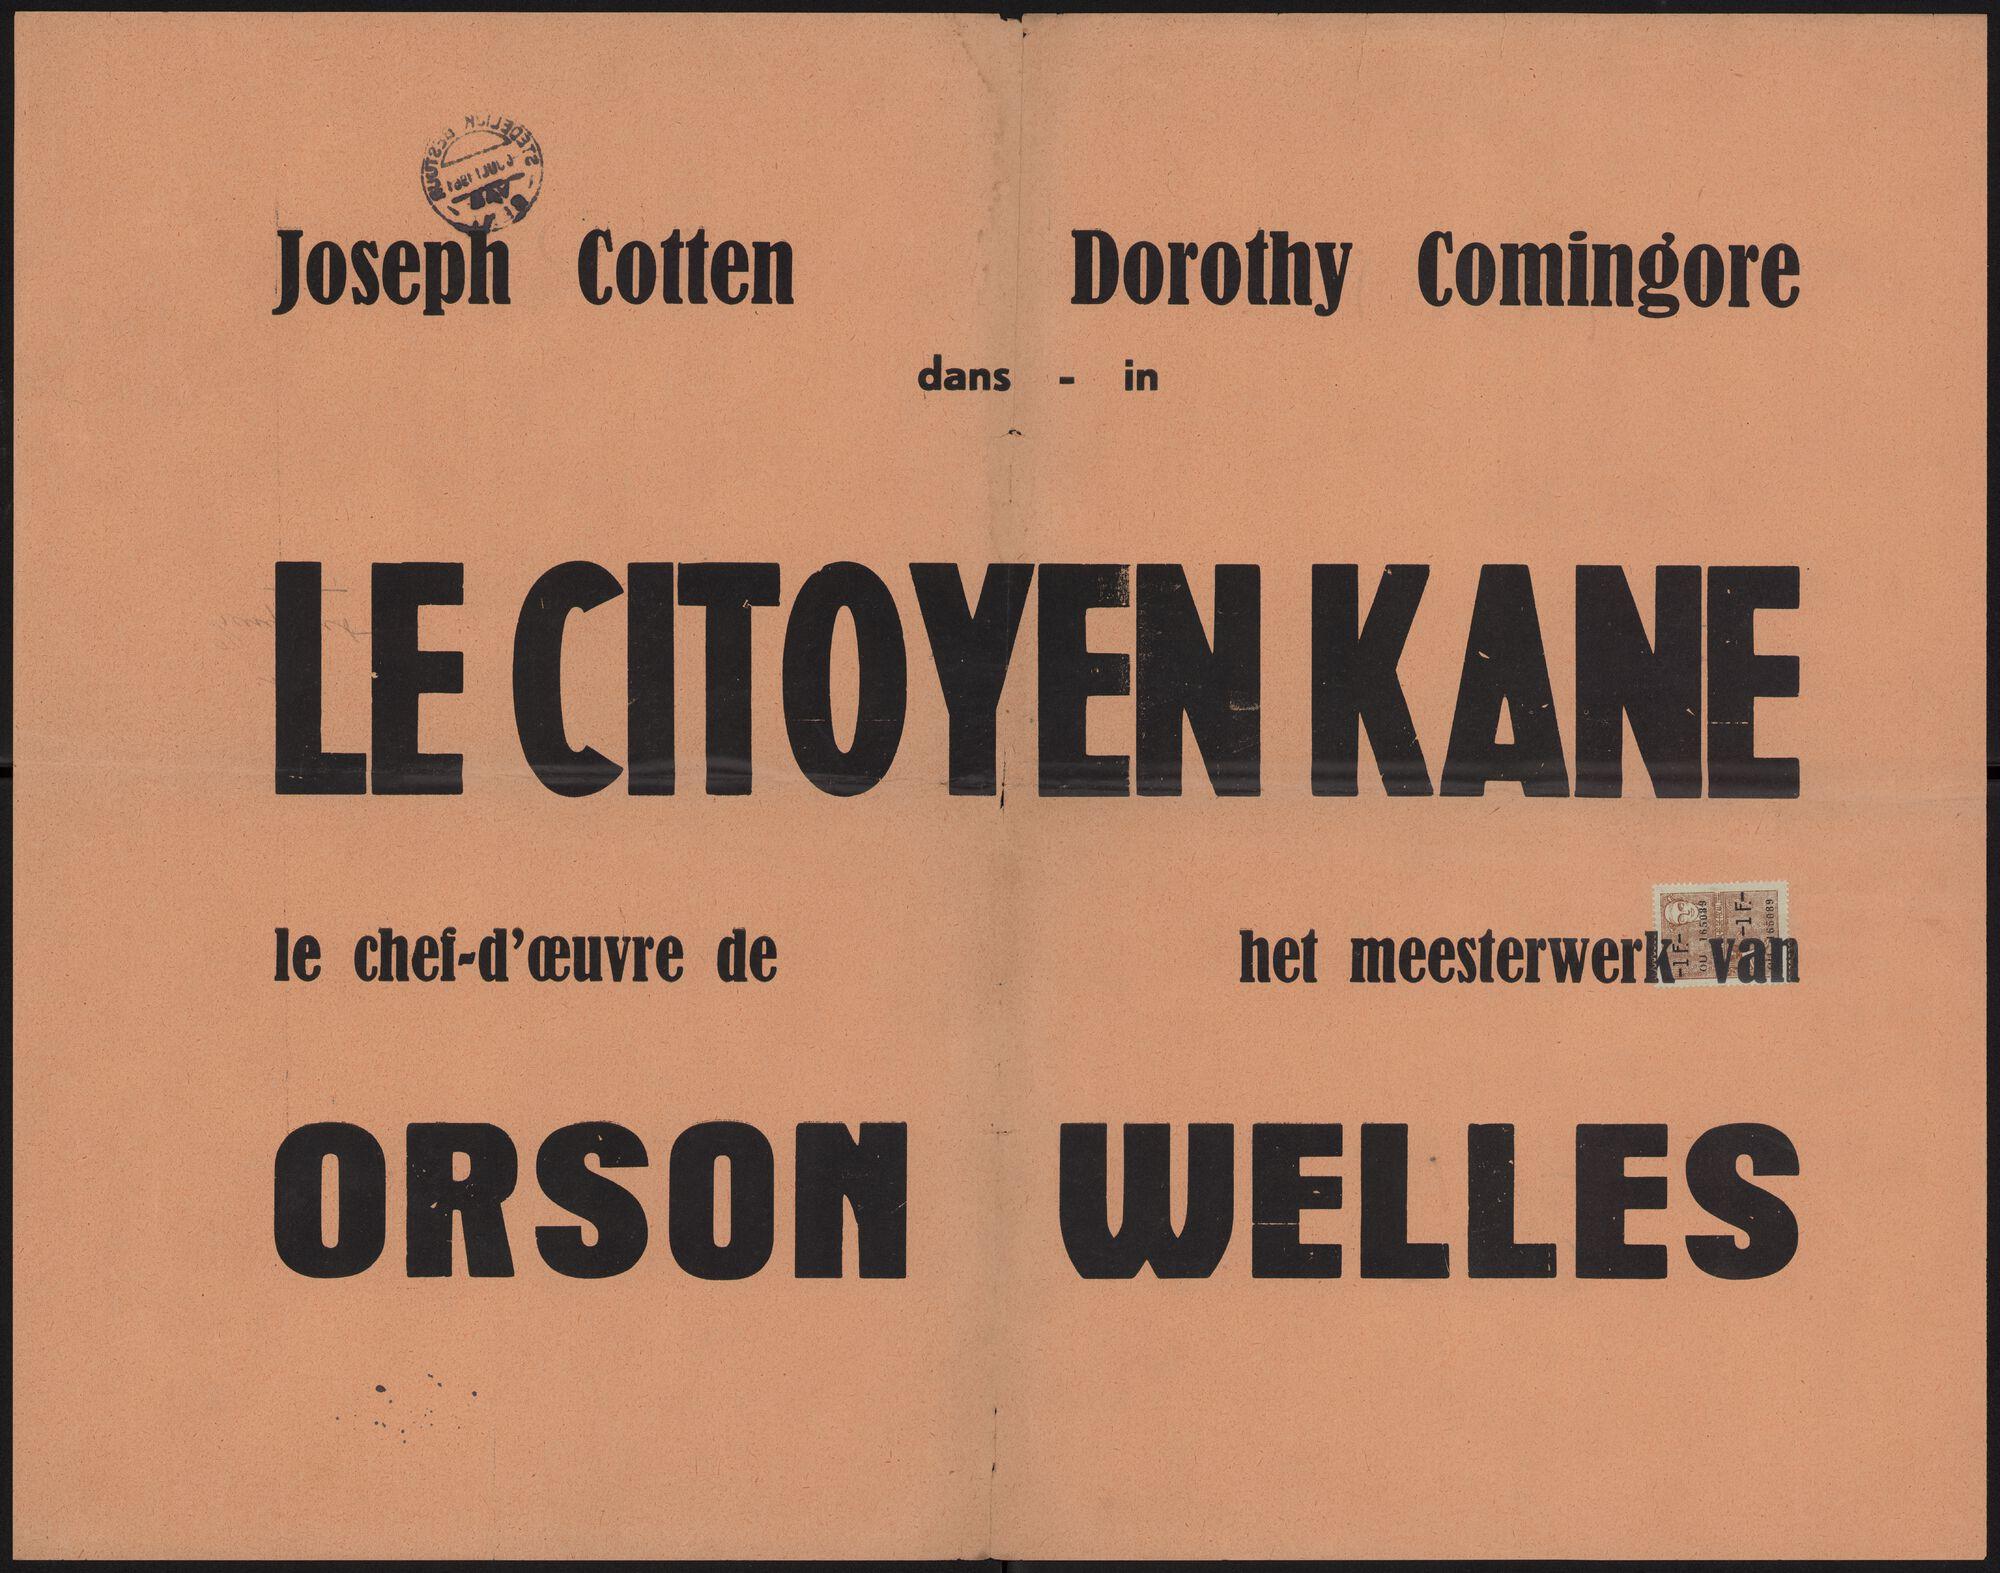 Le citoyen Kane, [Gent], juli 1961